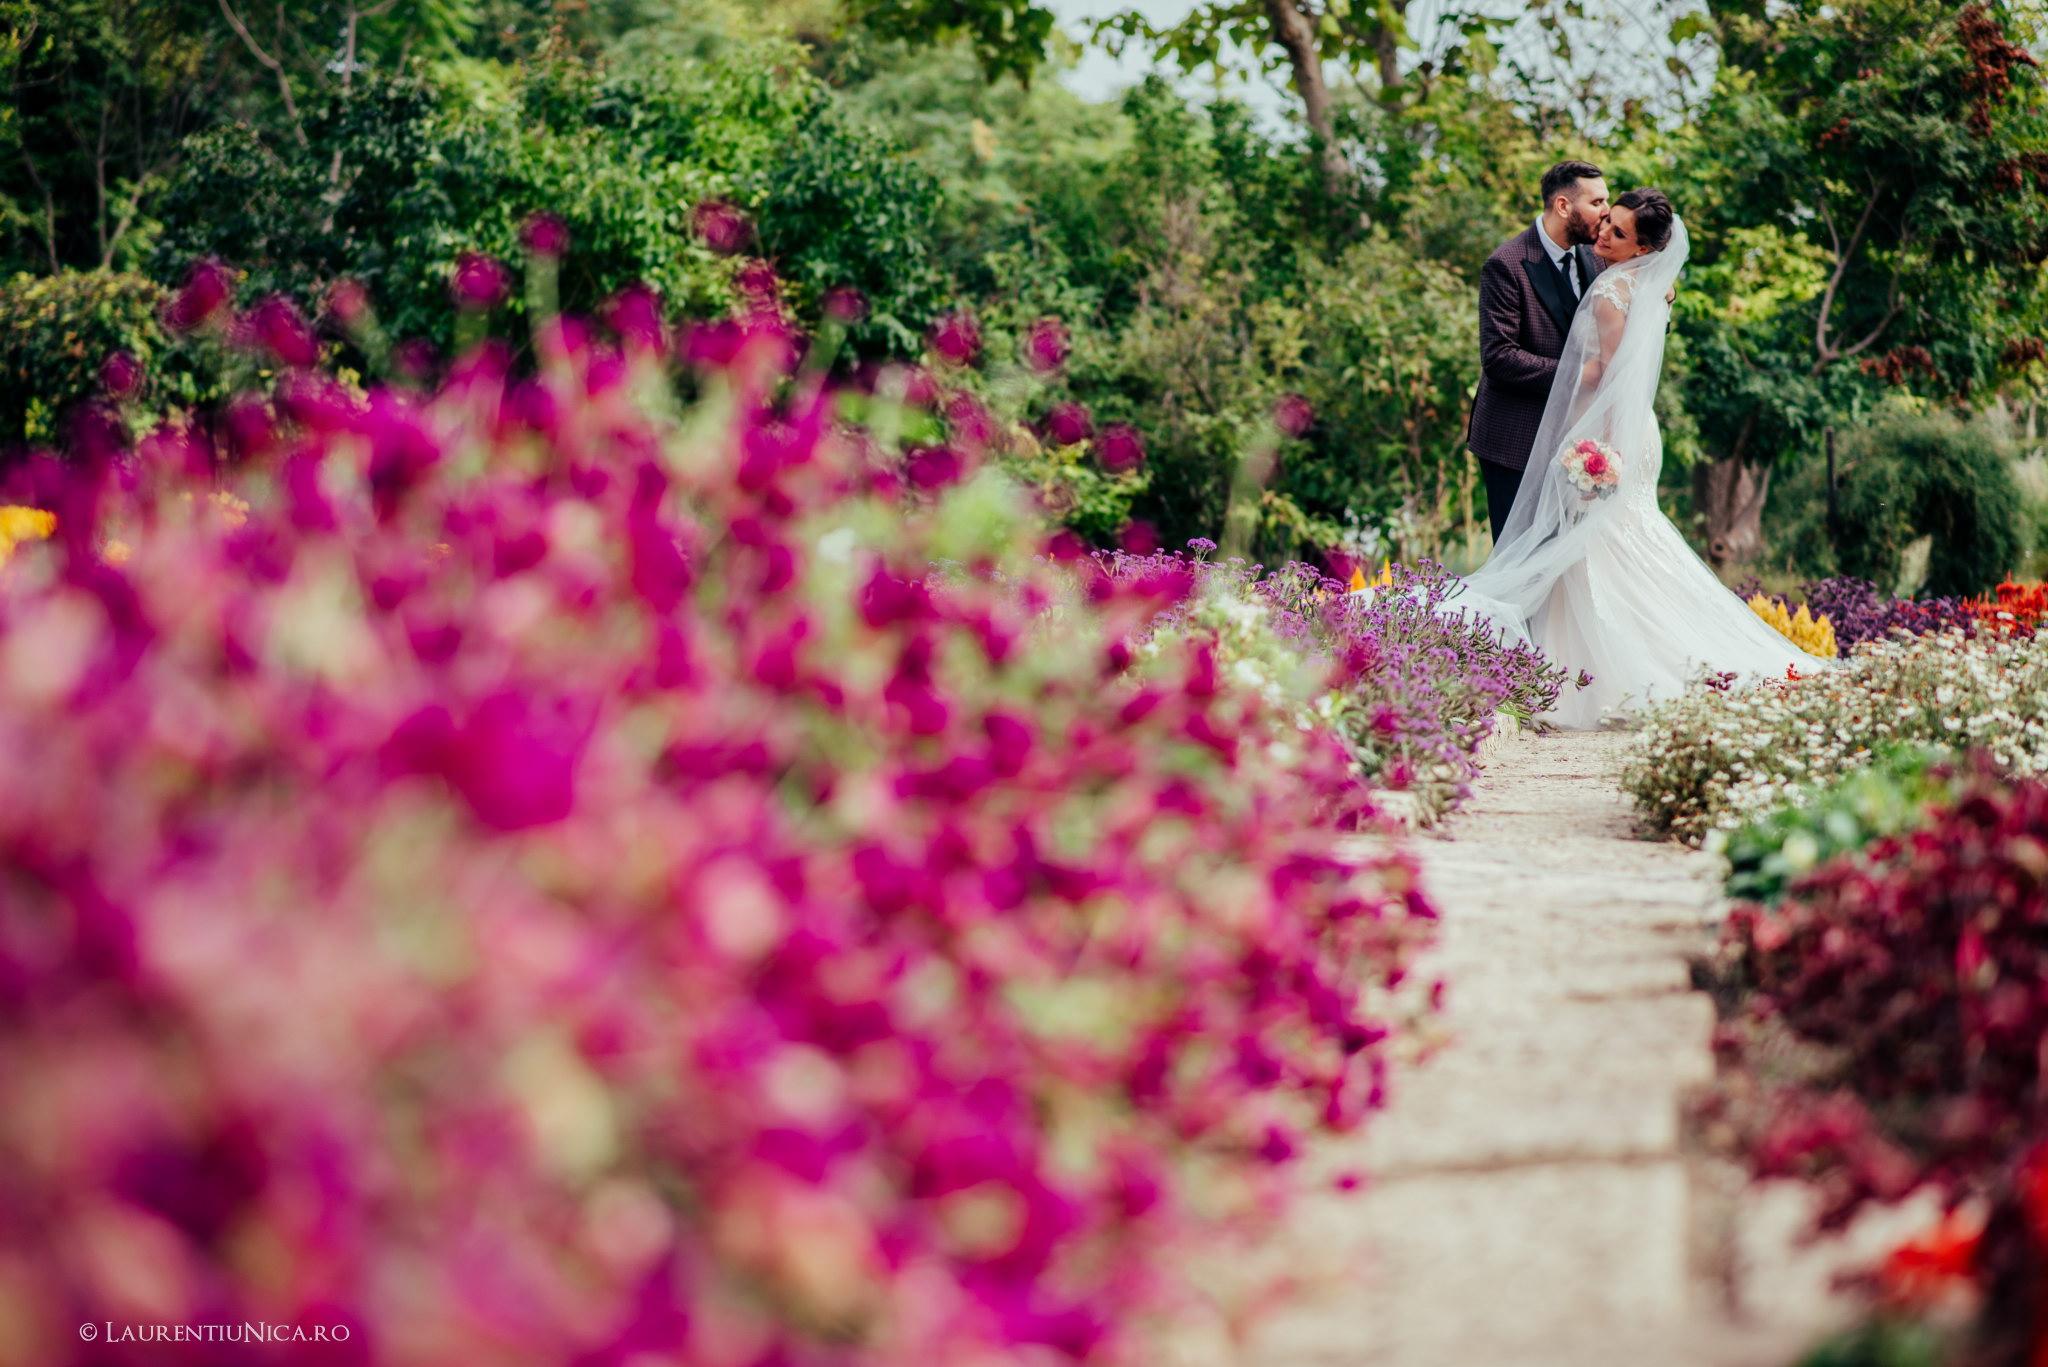 andreea si alin fotografii after wedding balchik bulgaria12 - Andreea & Alin | Fotografii After Wedding | Balchik Bulgaria